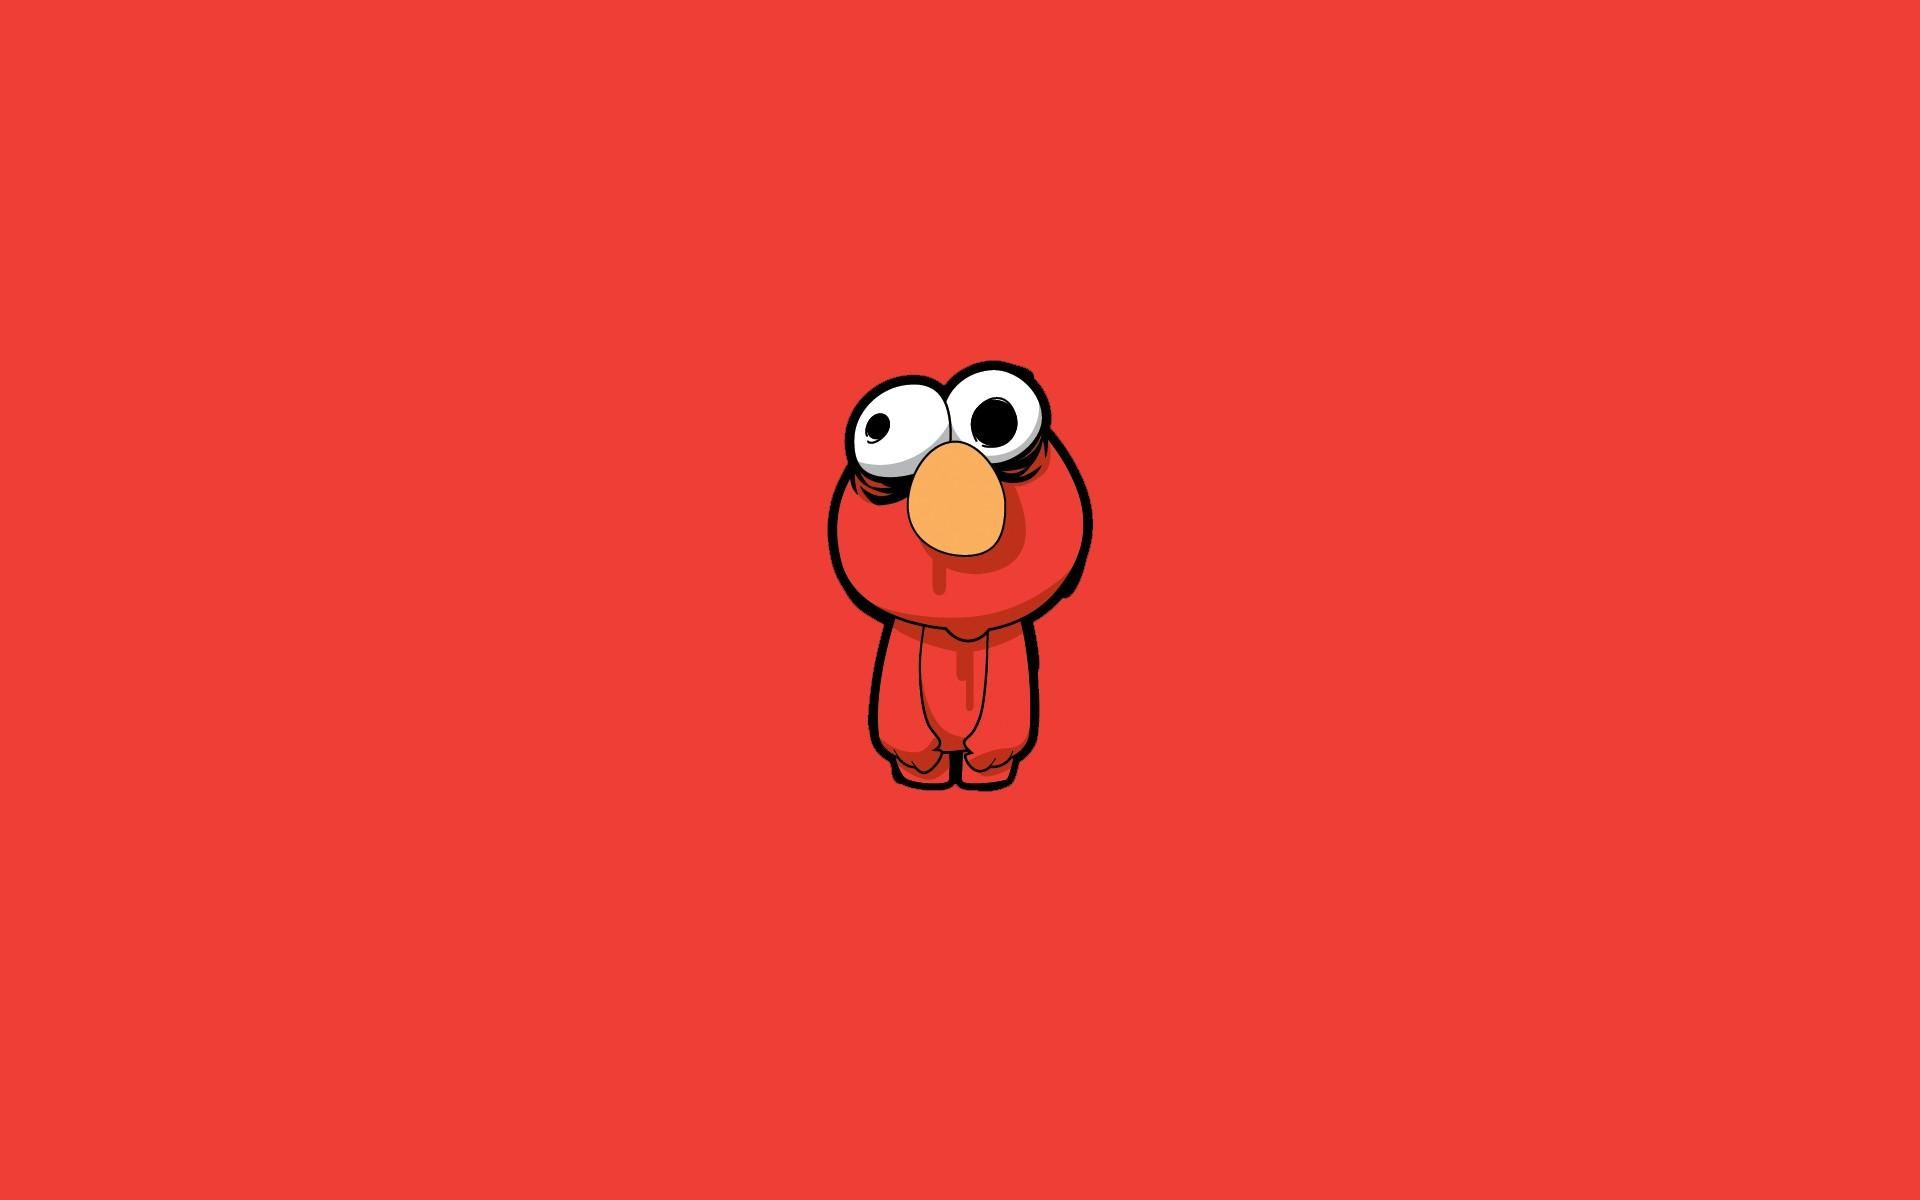 Elmo Wallpaper HD HD Wallpapers Pinterest Elmo and Wallpaper